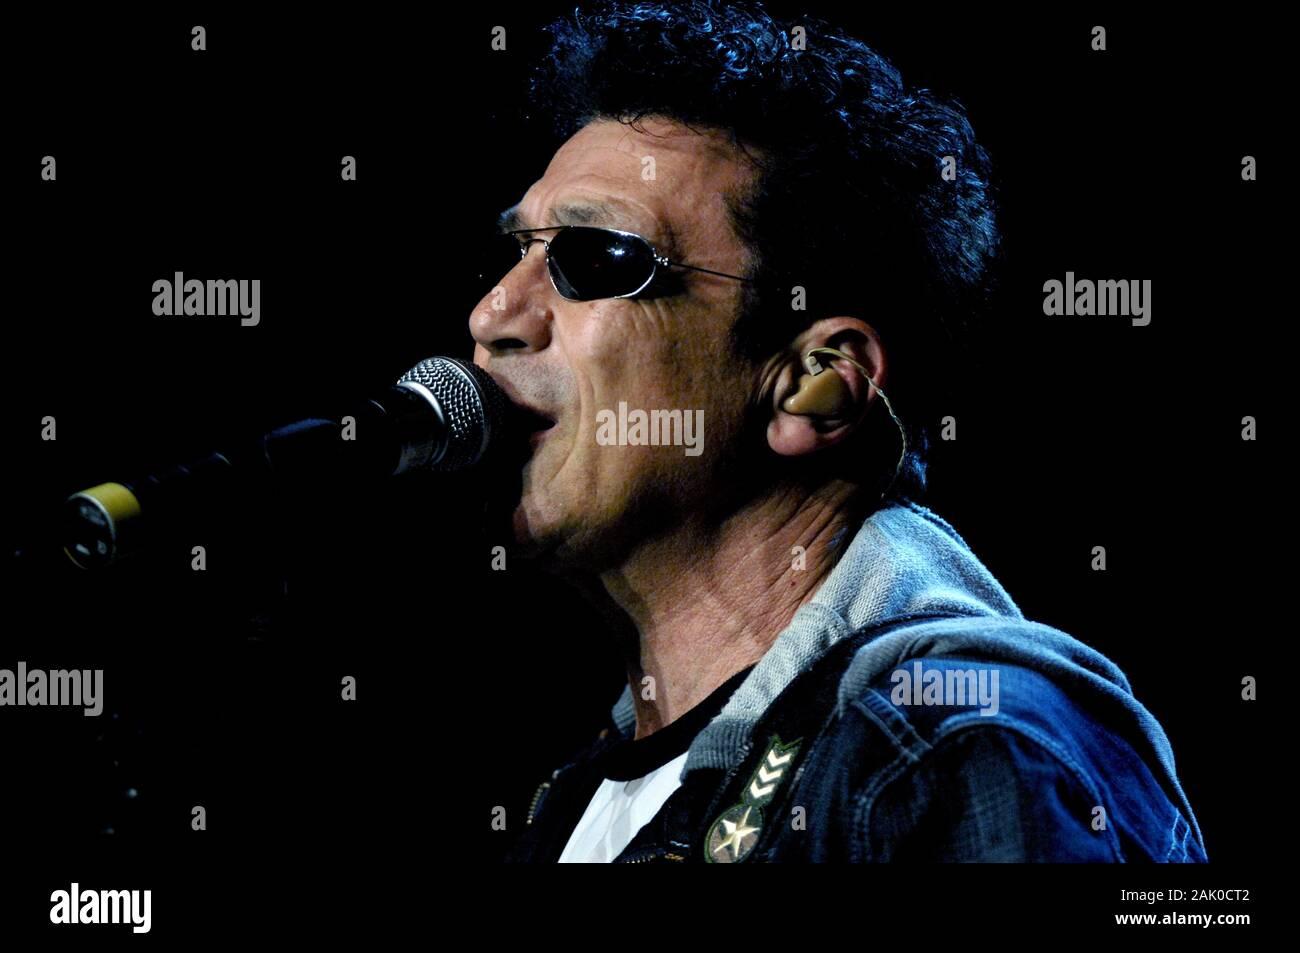 Milan Italy  25 March 2007 , Live concert of 25th birthday of Radio Italia at the DatchForum Assago: The singer Edoardo Bennato during the show Stock Photo